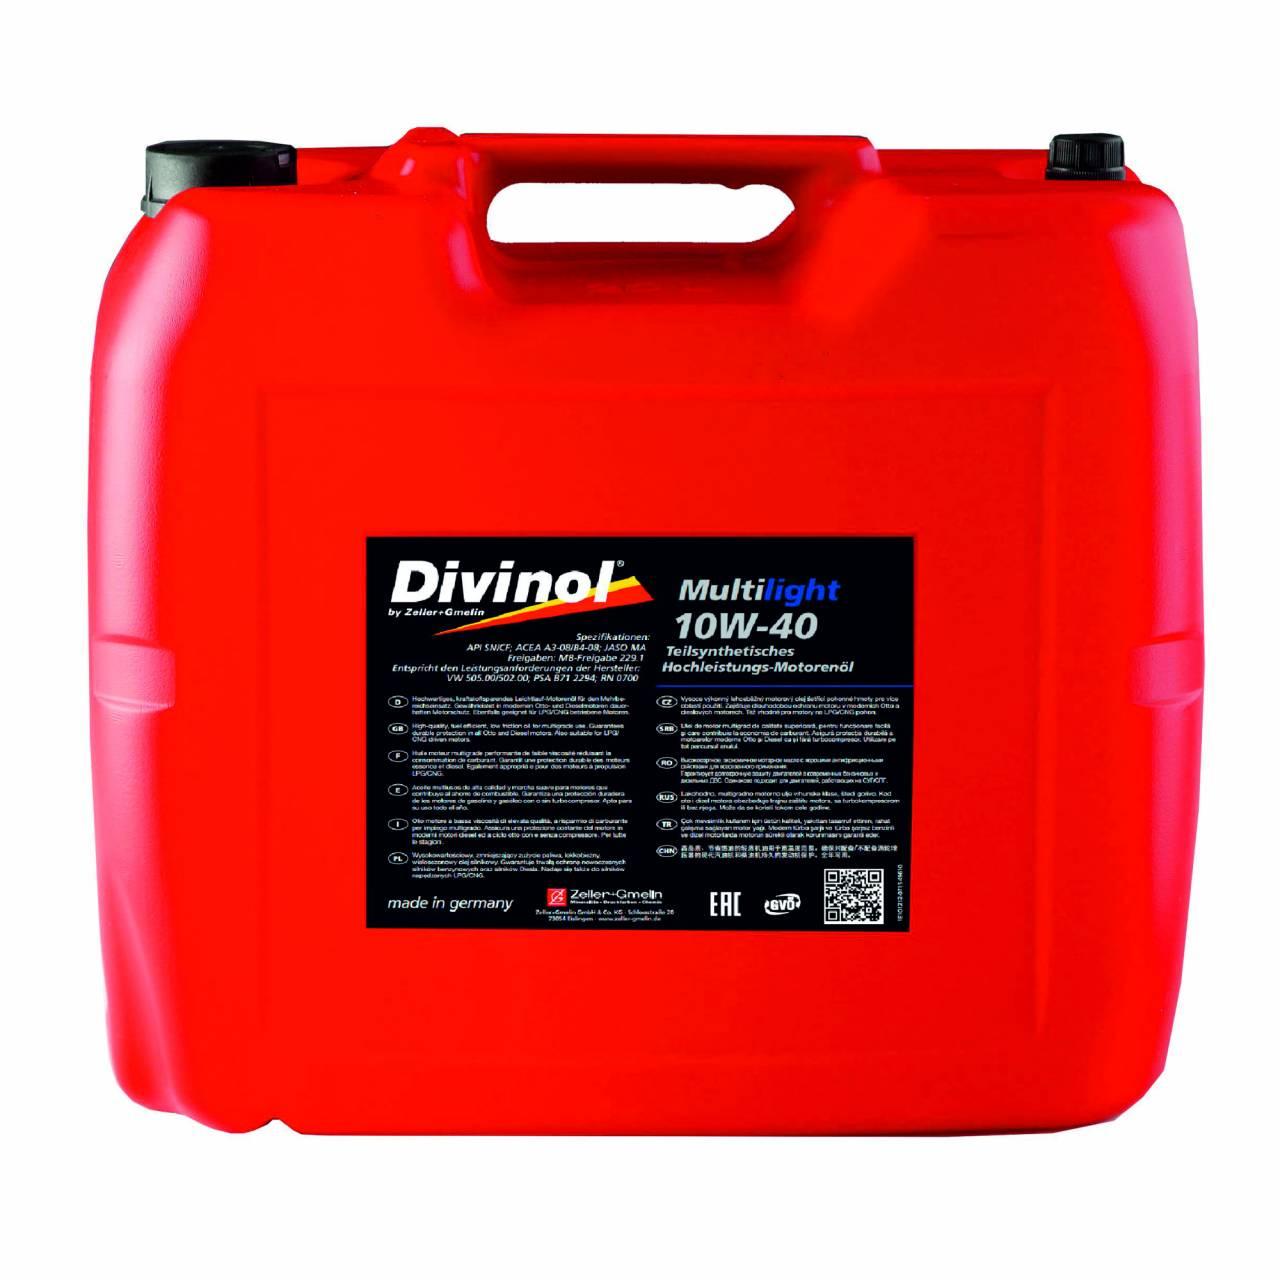 Motorenöl 'Divinol' Multilight 10W-40 / 20,0 Liter Kanister